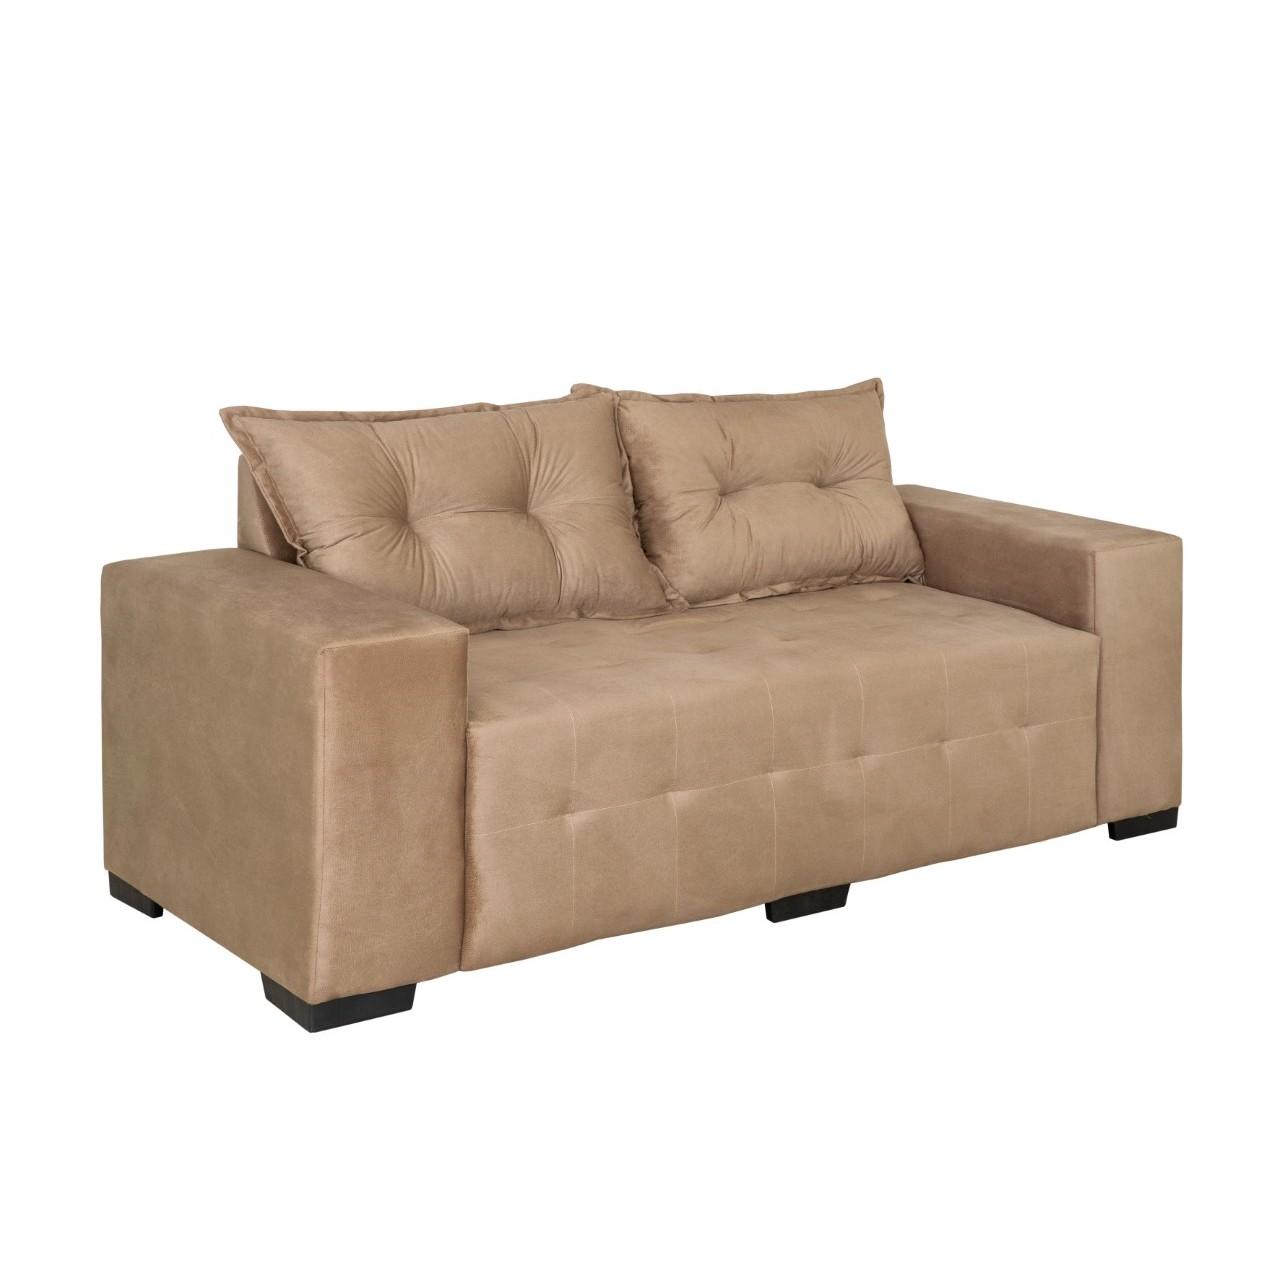 Sofa Cairo 3 Lugares Veludo Bege - Design Colchoes